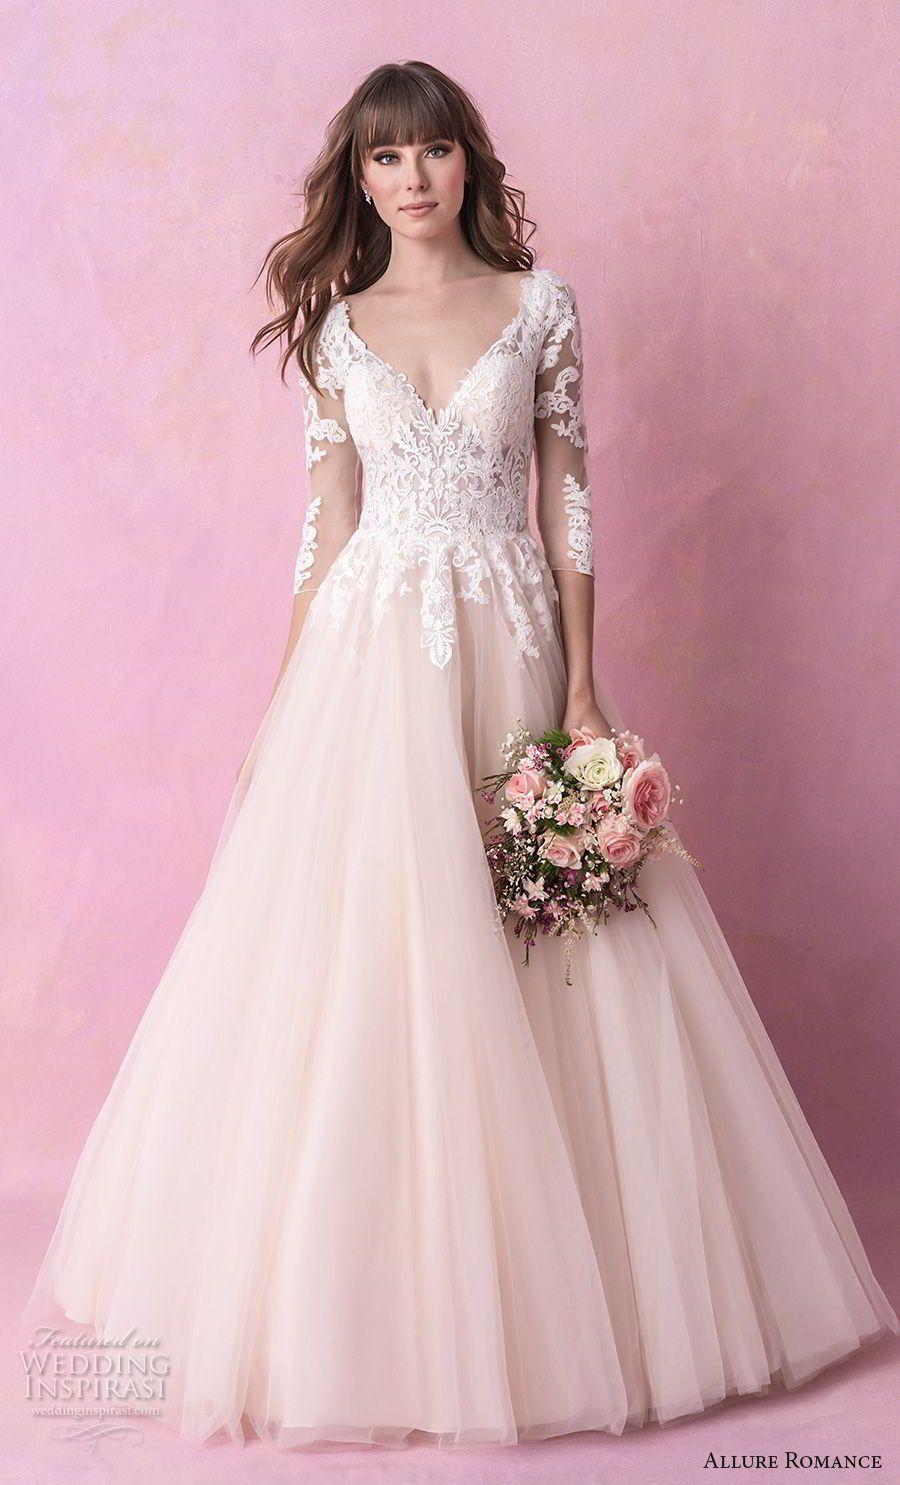 Allure Romance Fall 2018 Wedding Dresses | Wedding Dress by Wedding ...